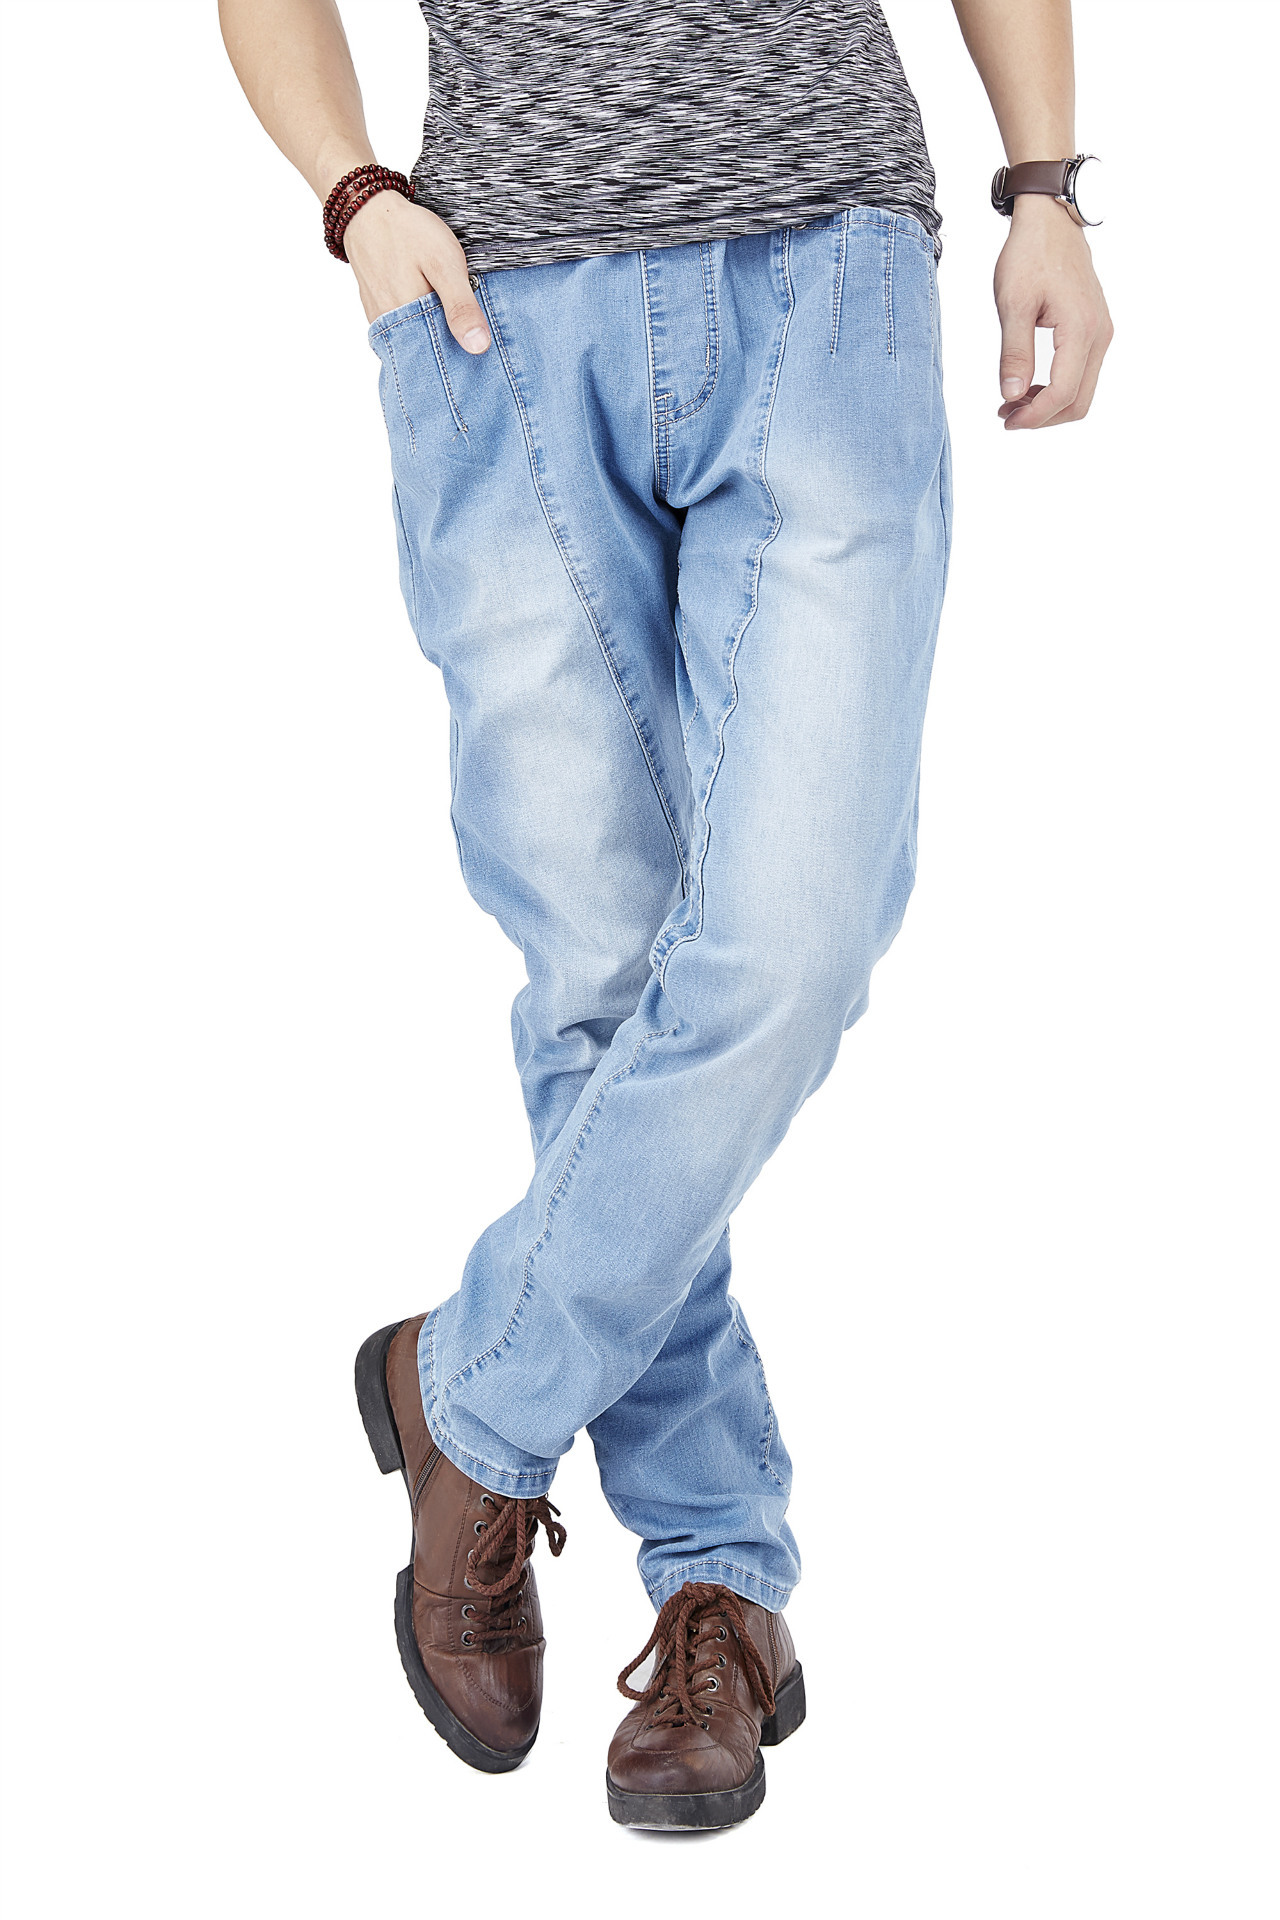 ФОТО 2016 Large Size Jeans Men Light Blue Brand Mens Jeans Slim Straight Stretch Pants Denim Trousers Size 30-46 Jeans For Men